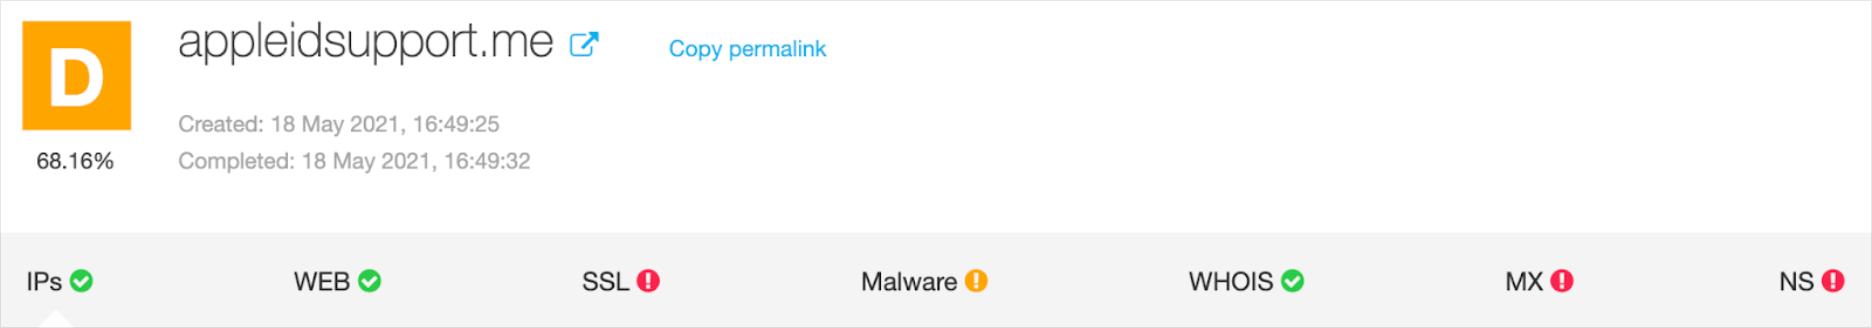 SideWinder DNS Blackholes Uncovered with Threat Intelligence Platform